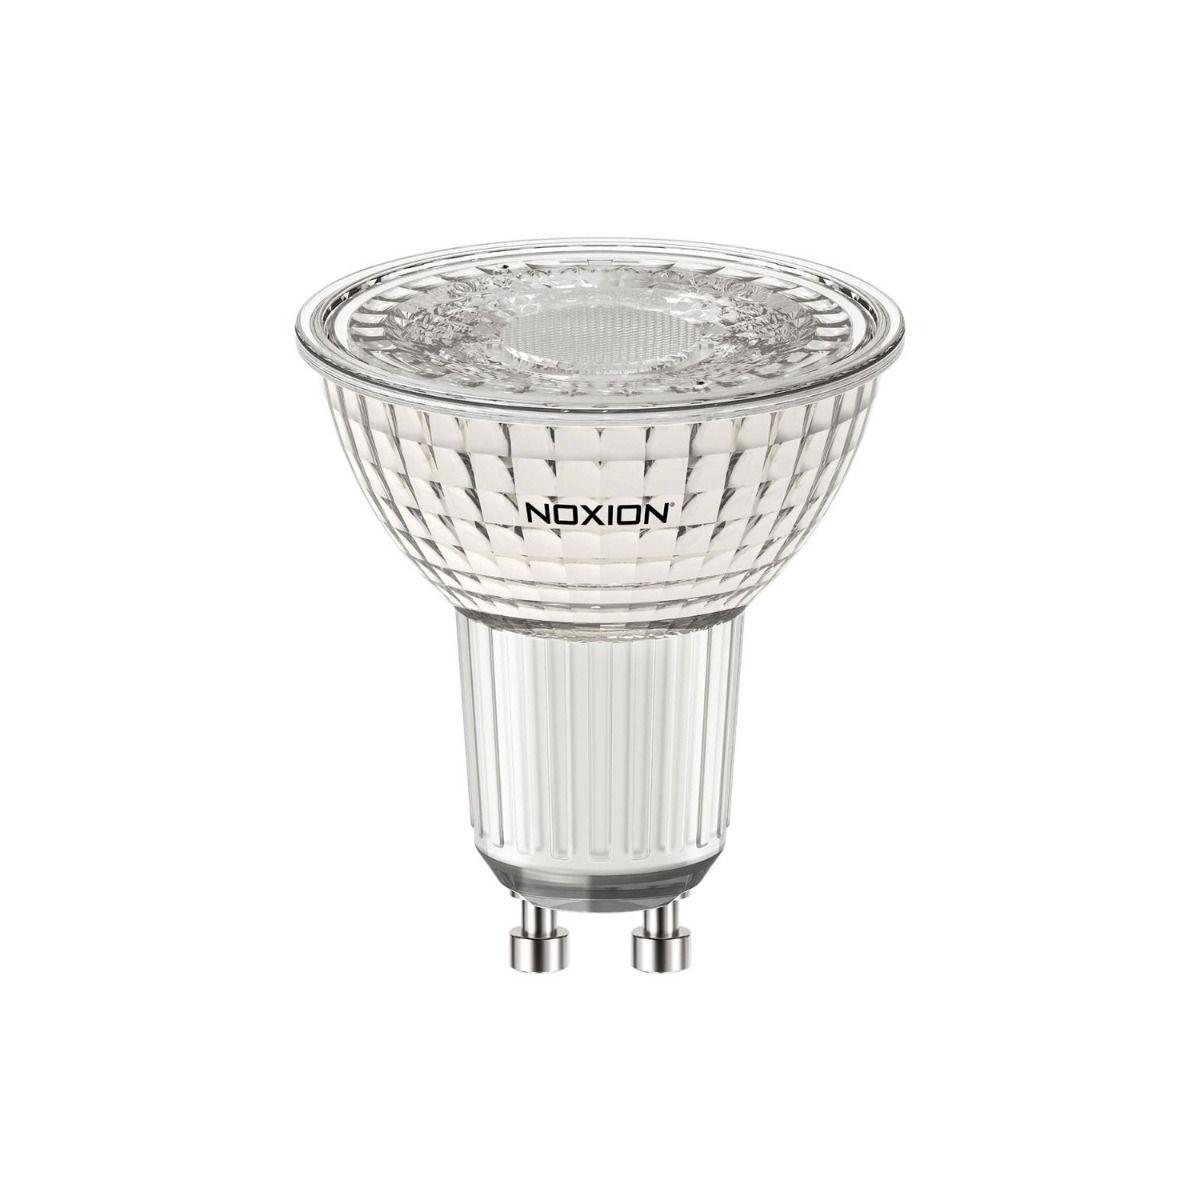 Noxion Foco LED PerfectColor GU10 4W 927 36D | Luz muy Cálida - Regulable - Reemplazo 50W